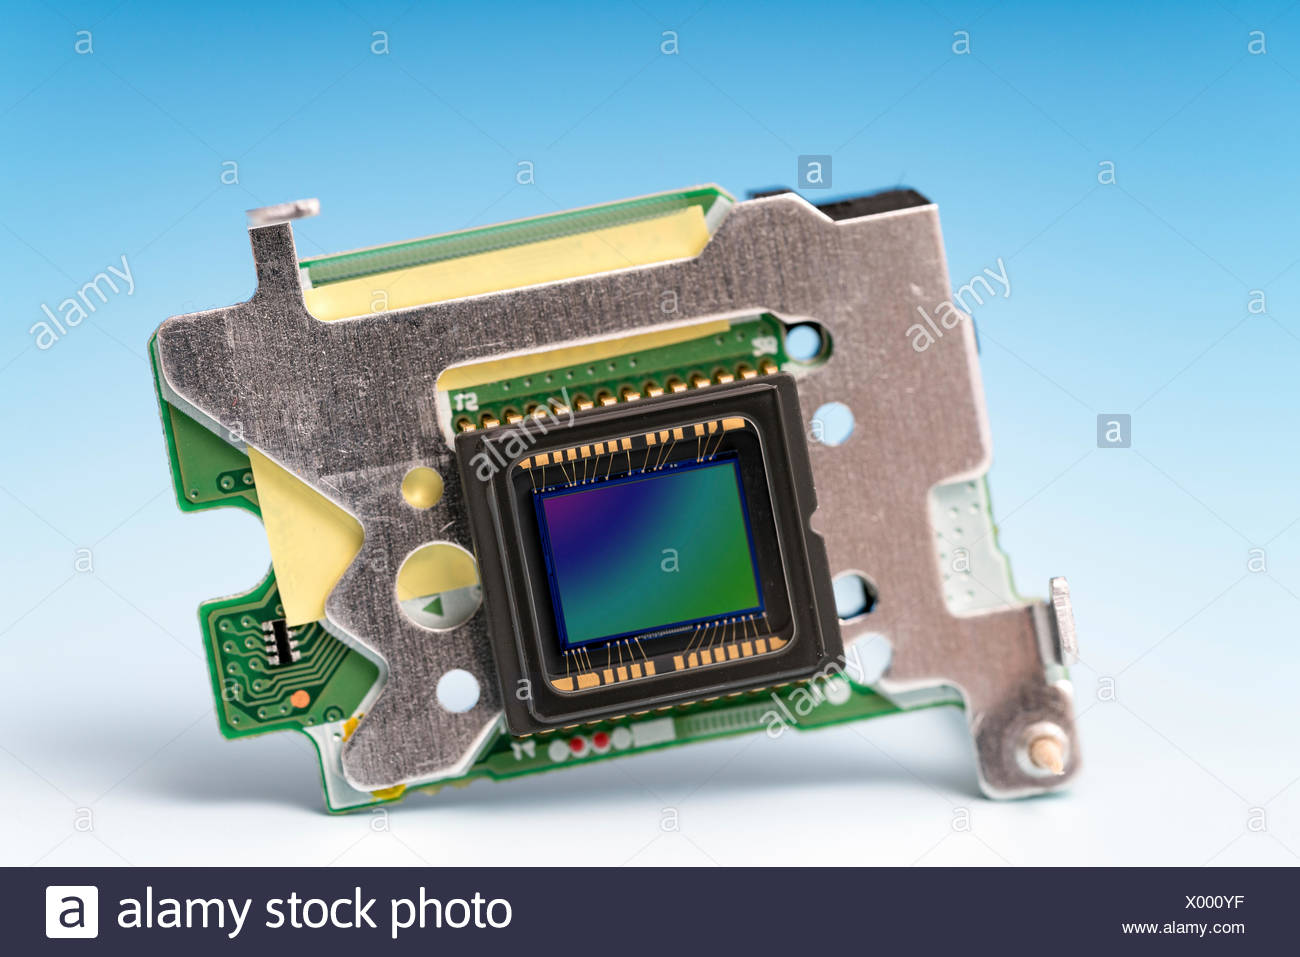 Charge coupled device, studio shot. - Stock Image